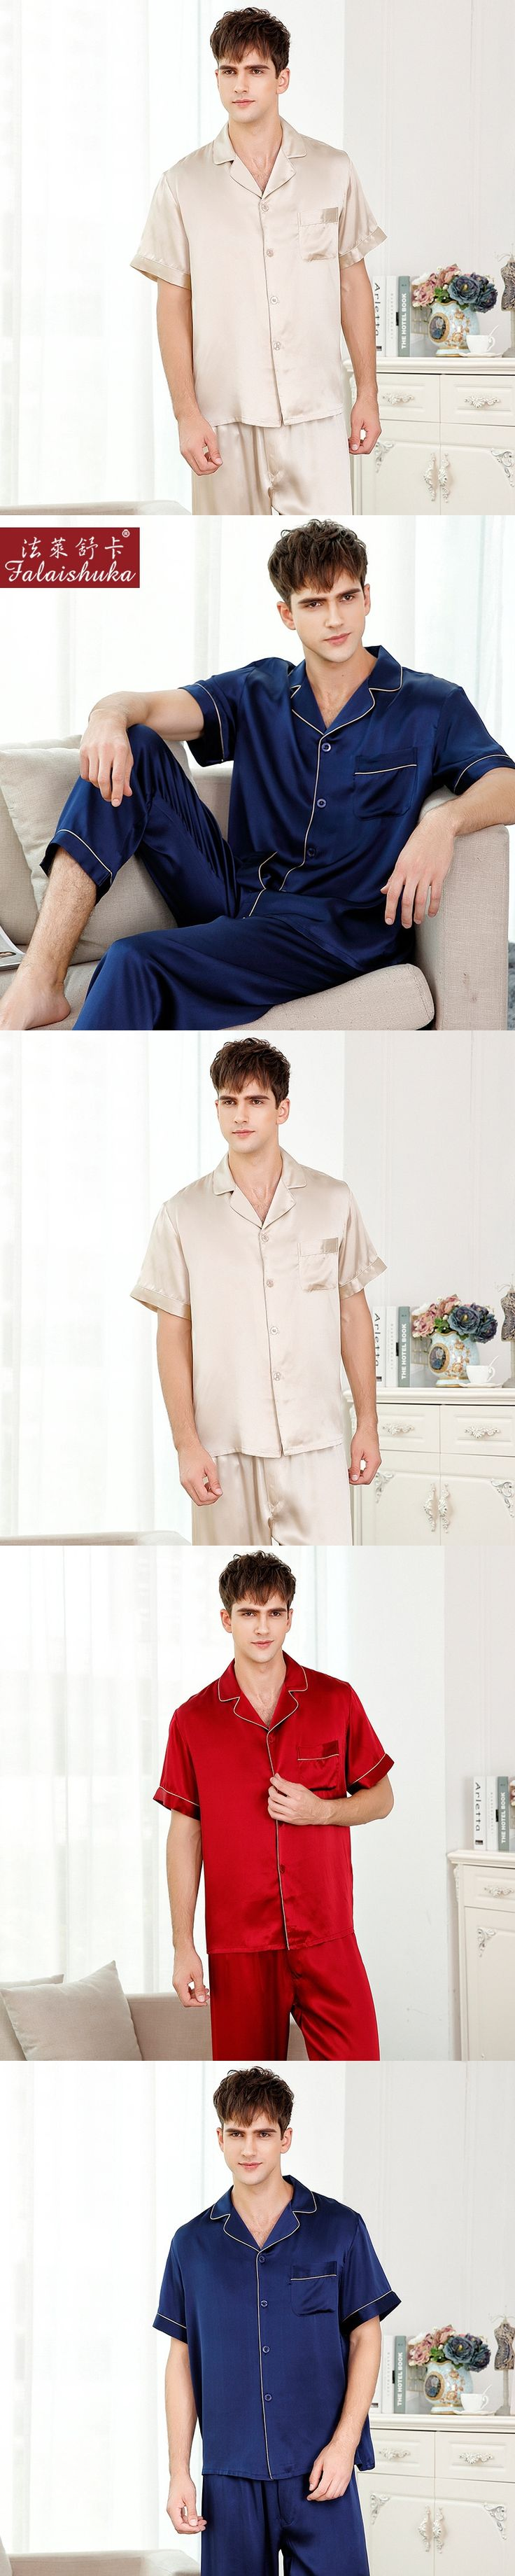 FLSK Brand Sexy Genuine Silk Men Pajamas 2017 NEW Summer Short Sleeve Pajama Pants Sets Pure Color 100% Mulberry Silk Sleepwear